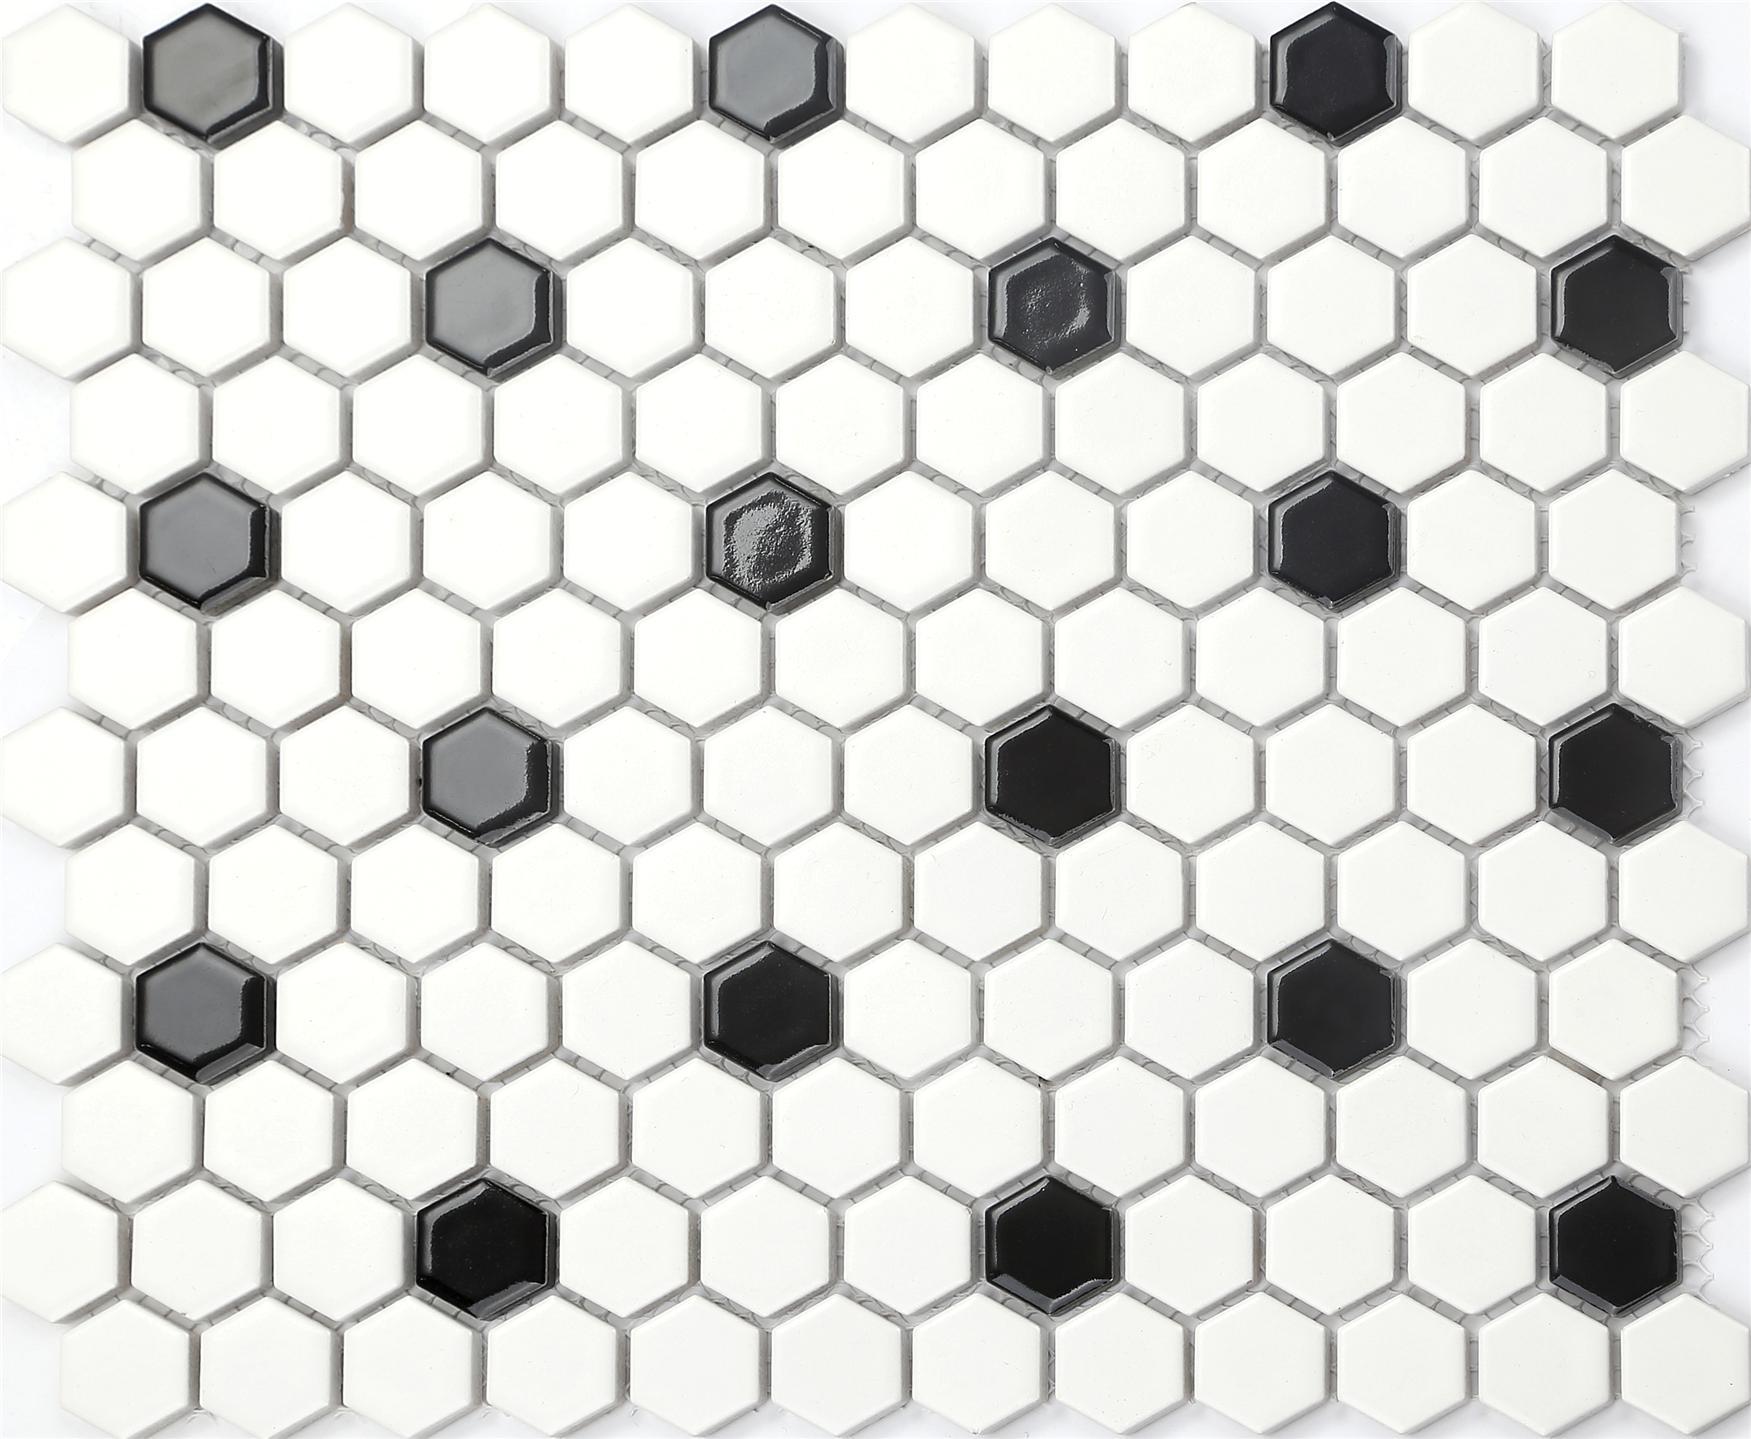 Tiles Black And White Ceramic Tile Black And White Ceramic Tiles Pictures To